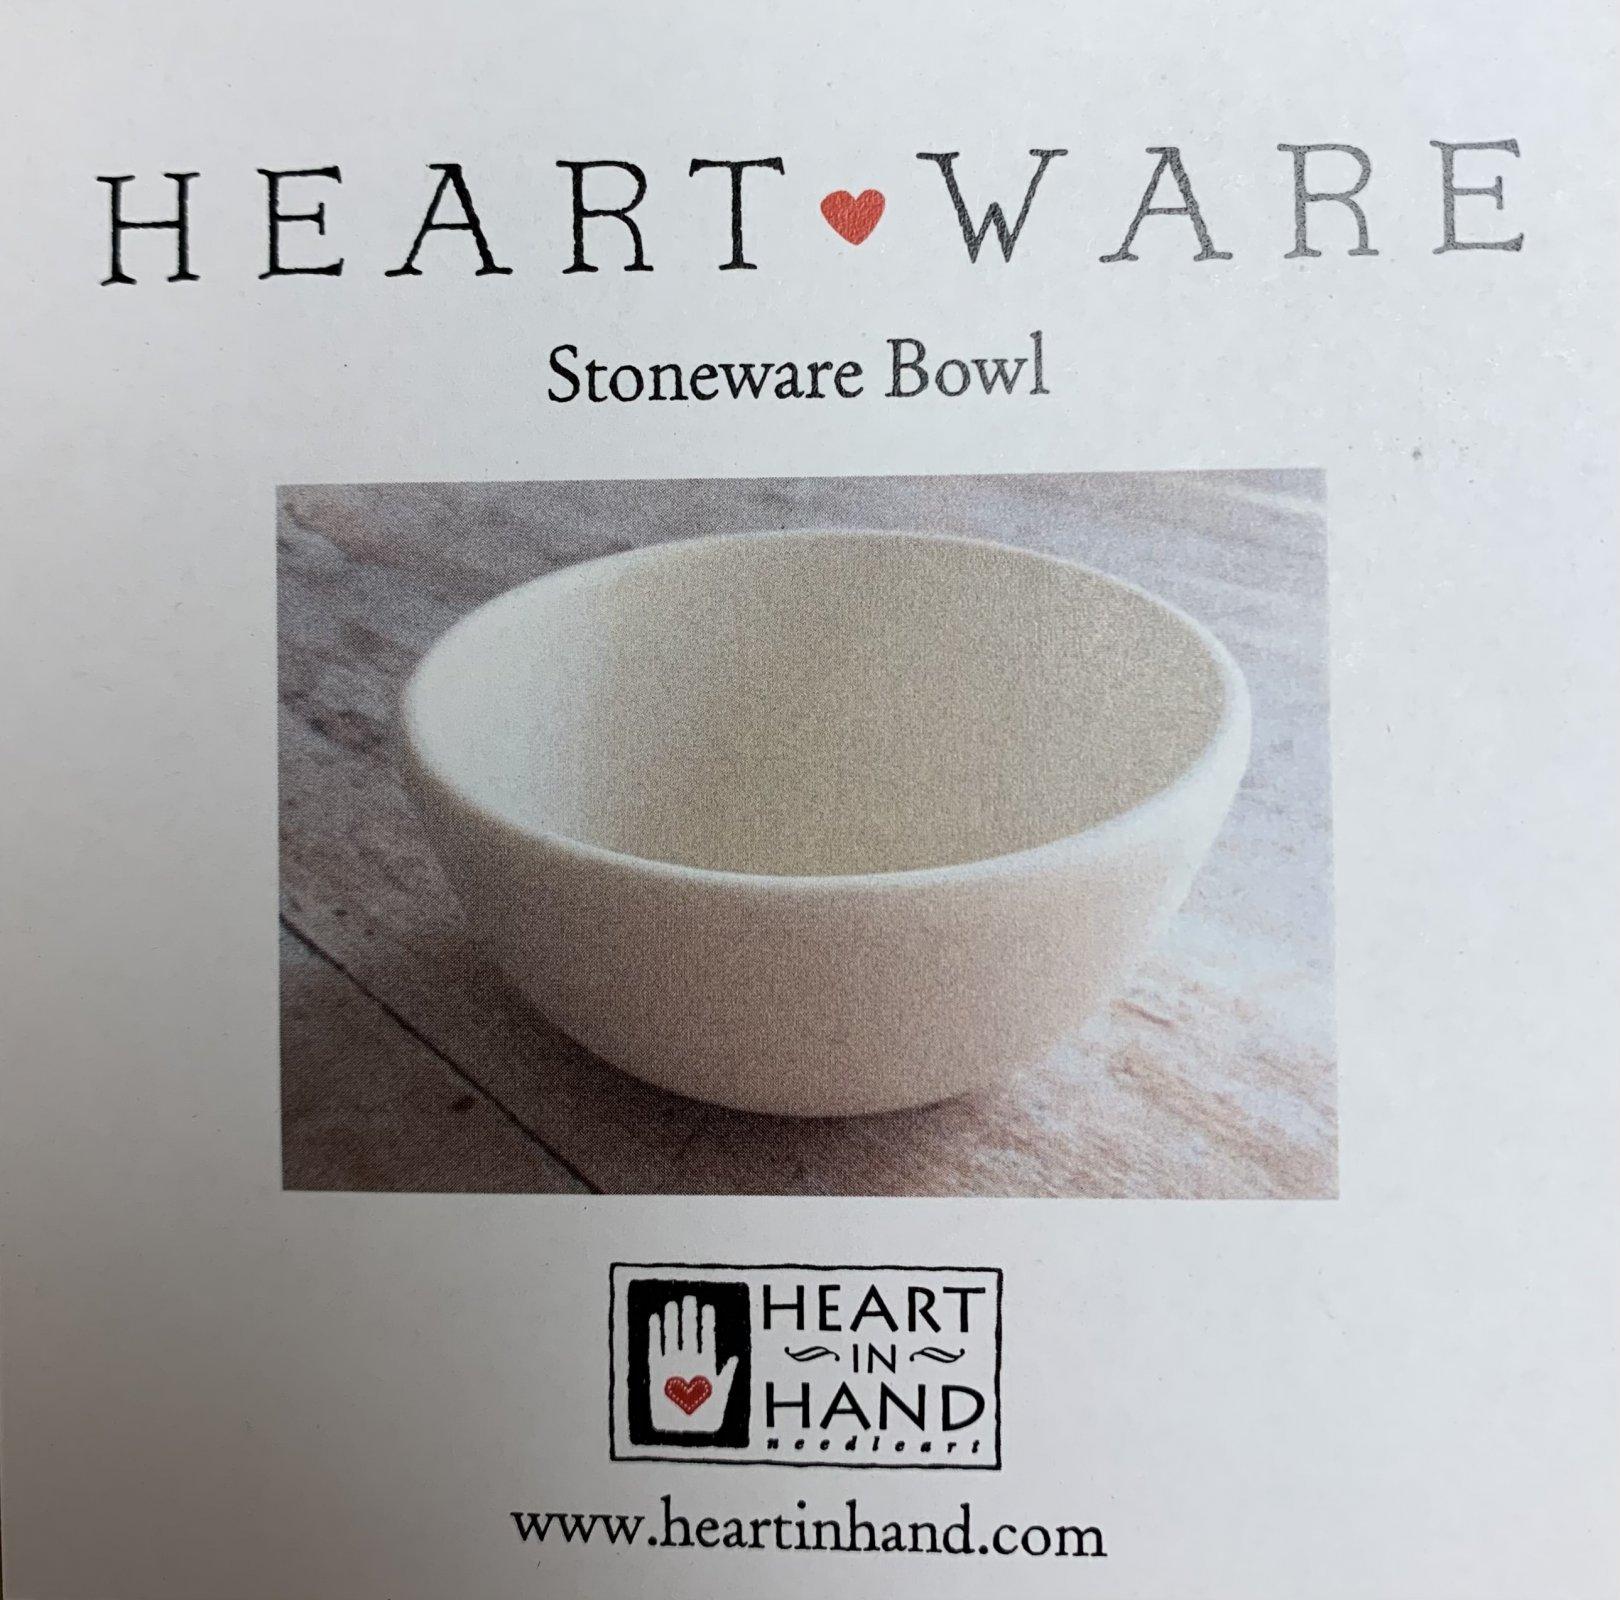 Heartware cream bowl - Heart in Hand